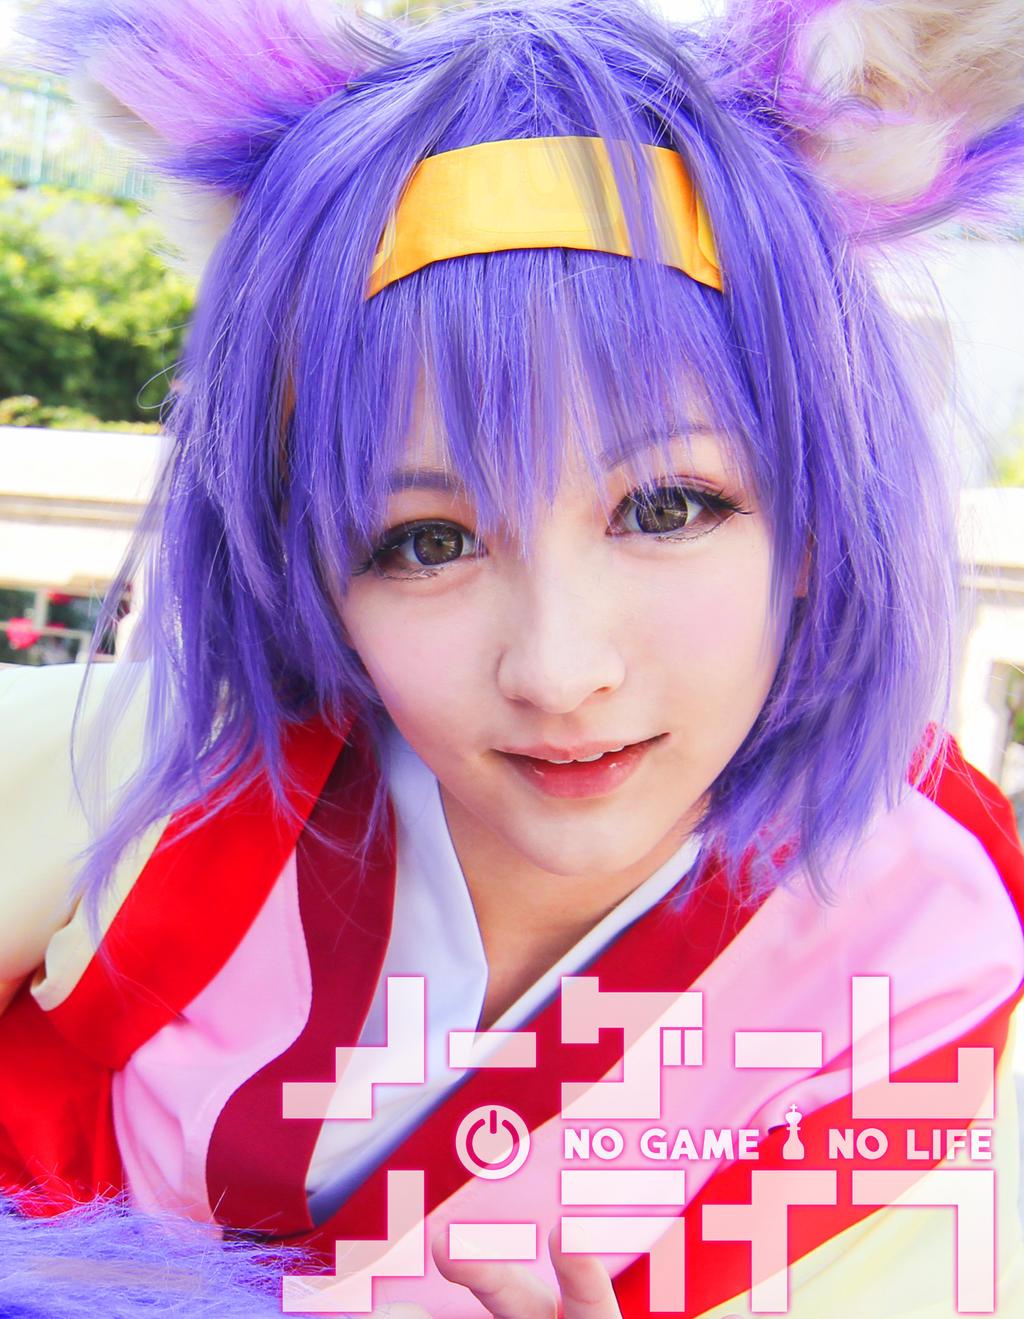 Izuna No Game No Life Cosplay - Hot Nude Photos-3363